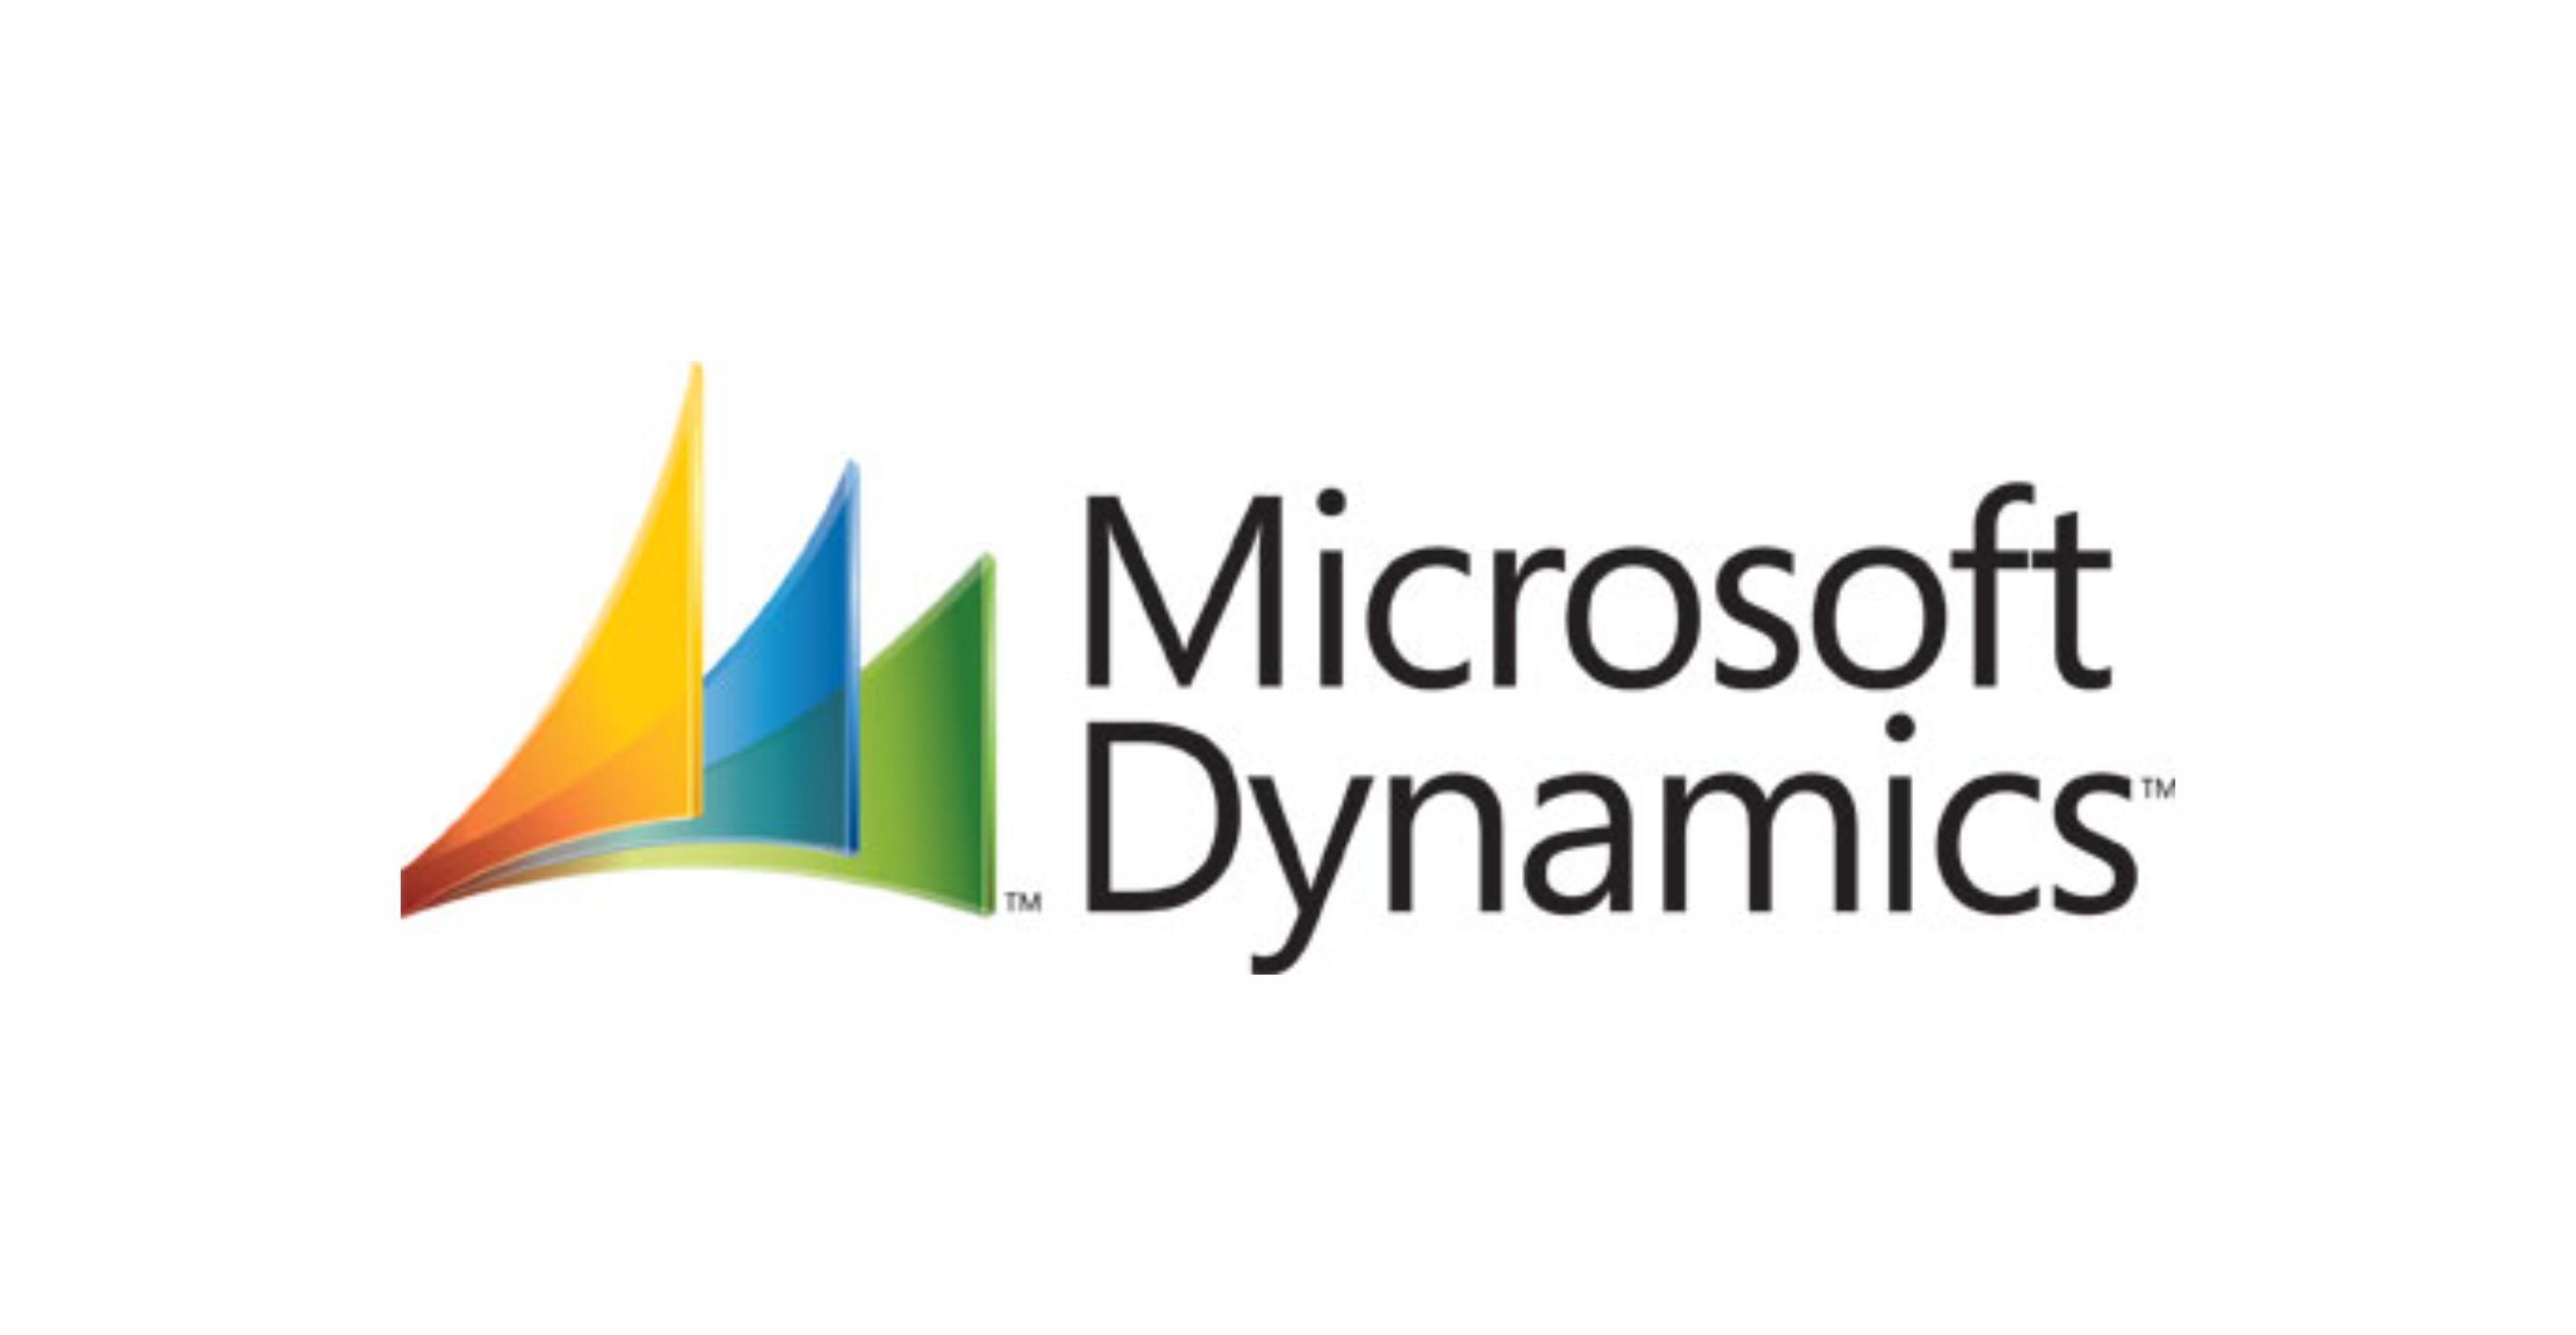 Microsoft Dynamics, la mejor herramienta para tu empresa